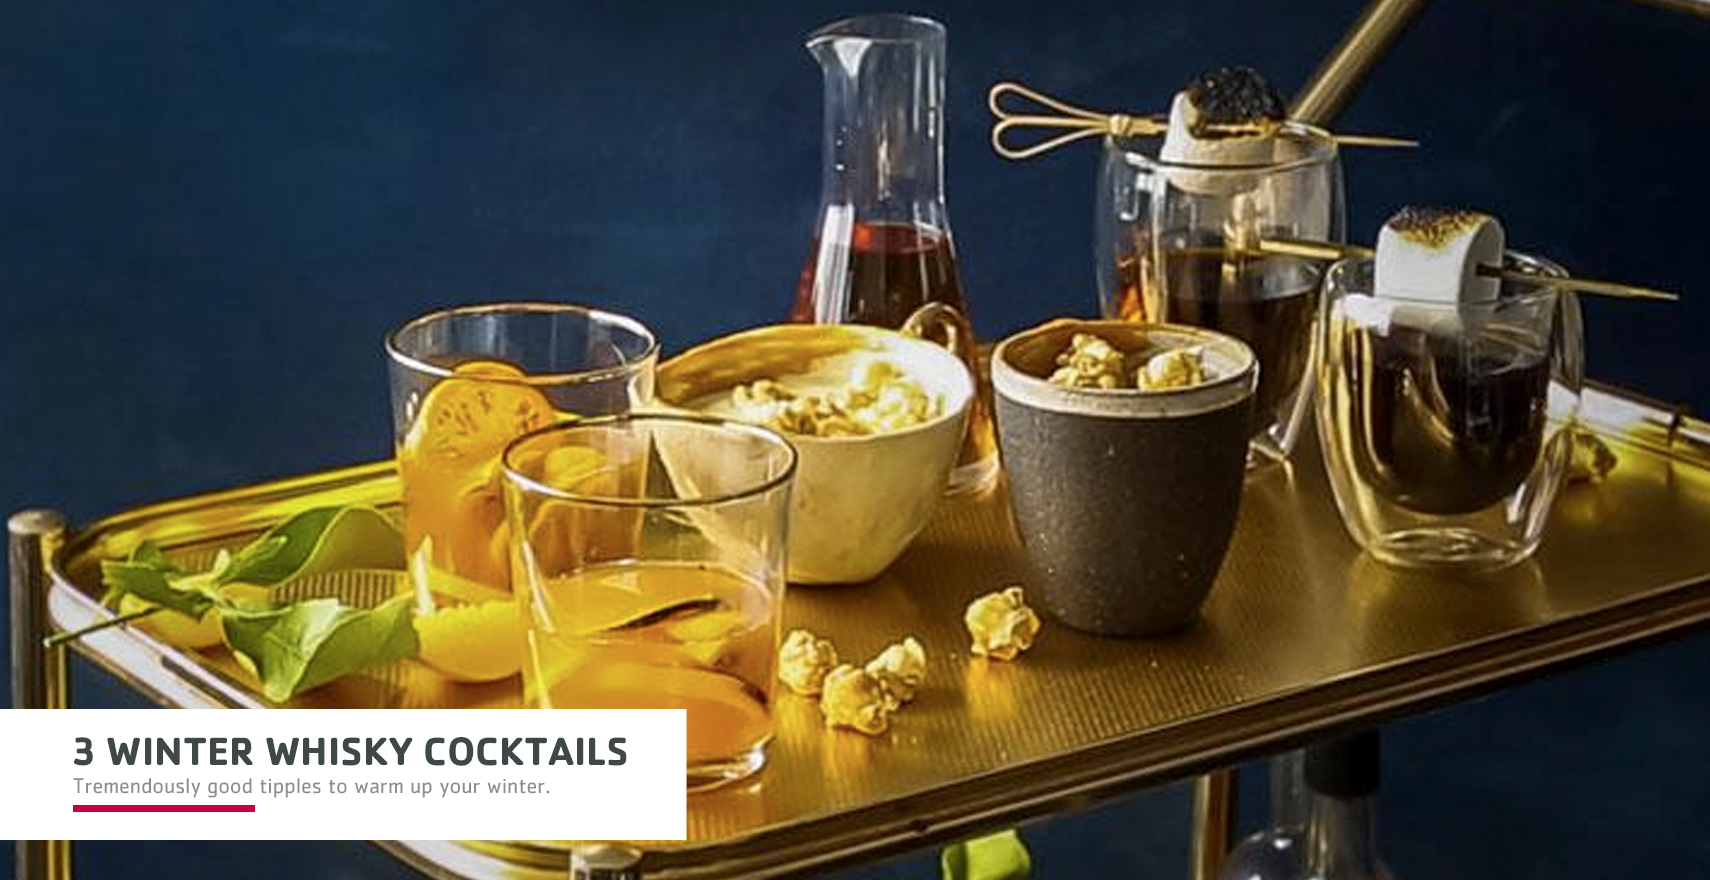 Cocktail-Recipe-header-image.jpg